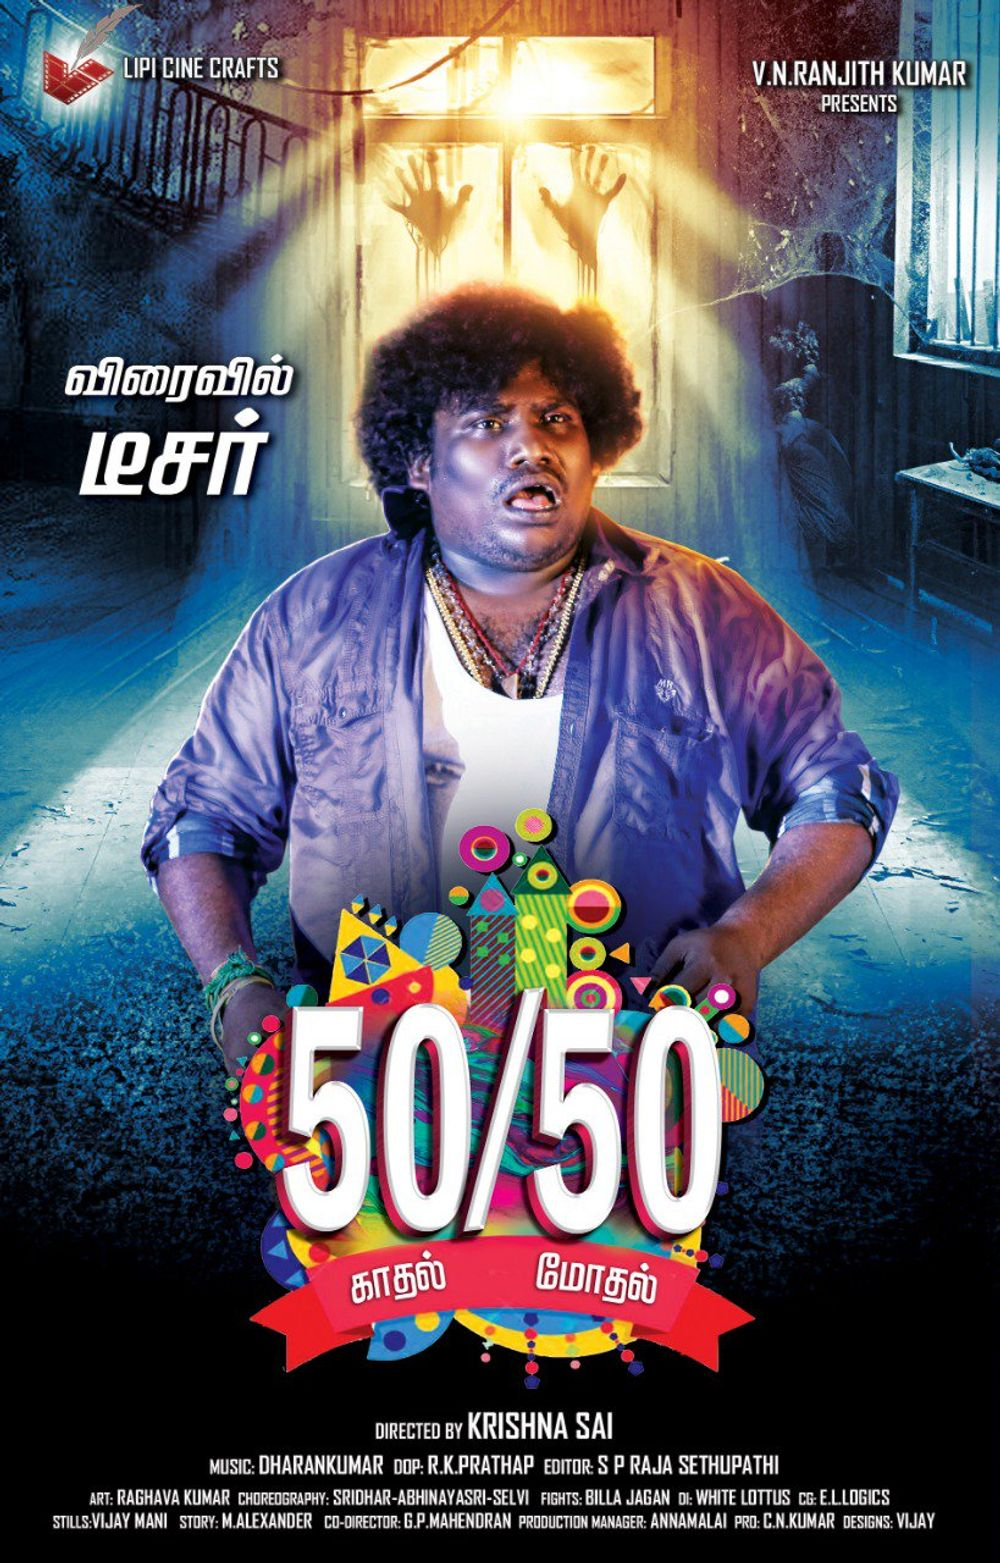 5050 Tamil HD Full Movie Download 2019, 5050 Tamil Movie